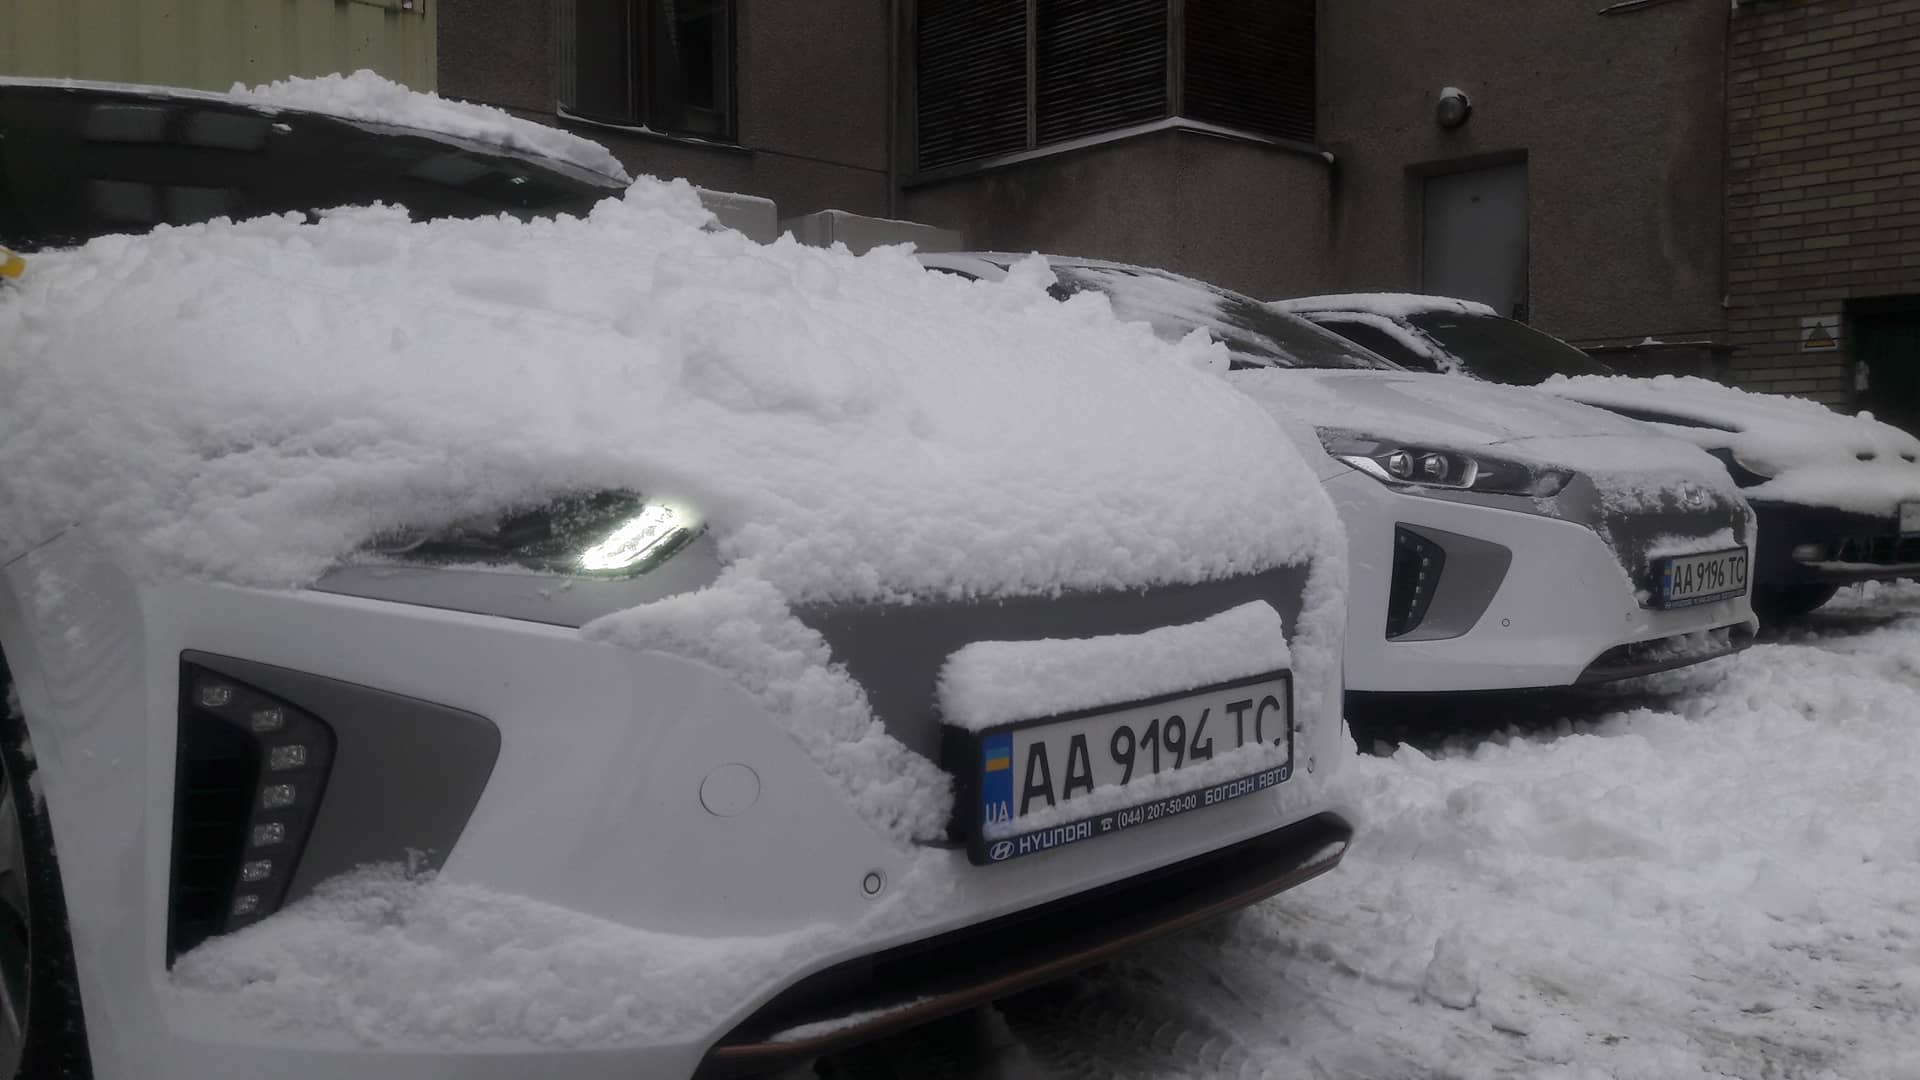 Электромобили Hyundai Ioniq эксплуатируемые компанией ДТЭК